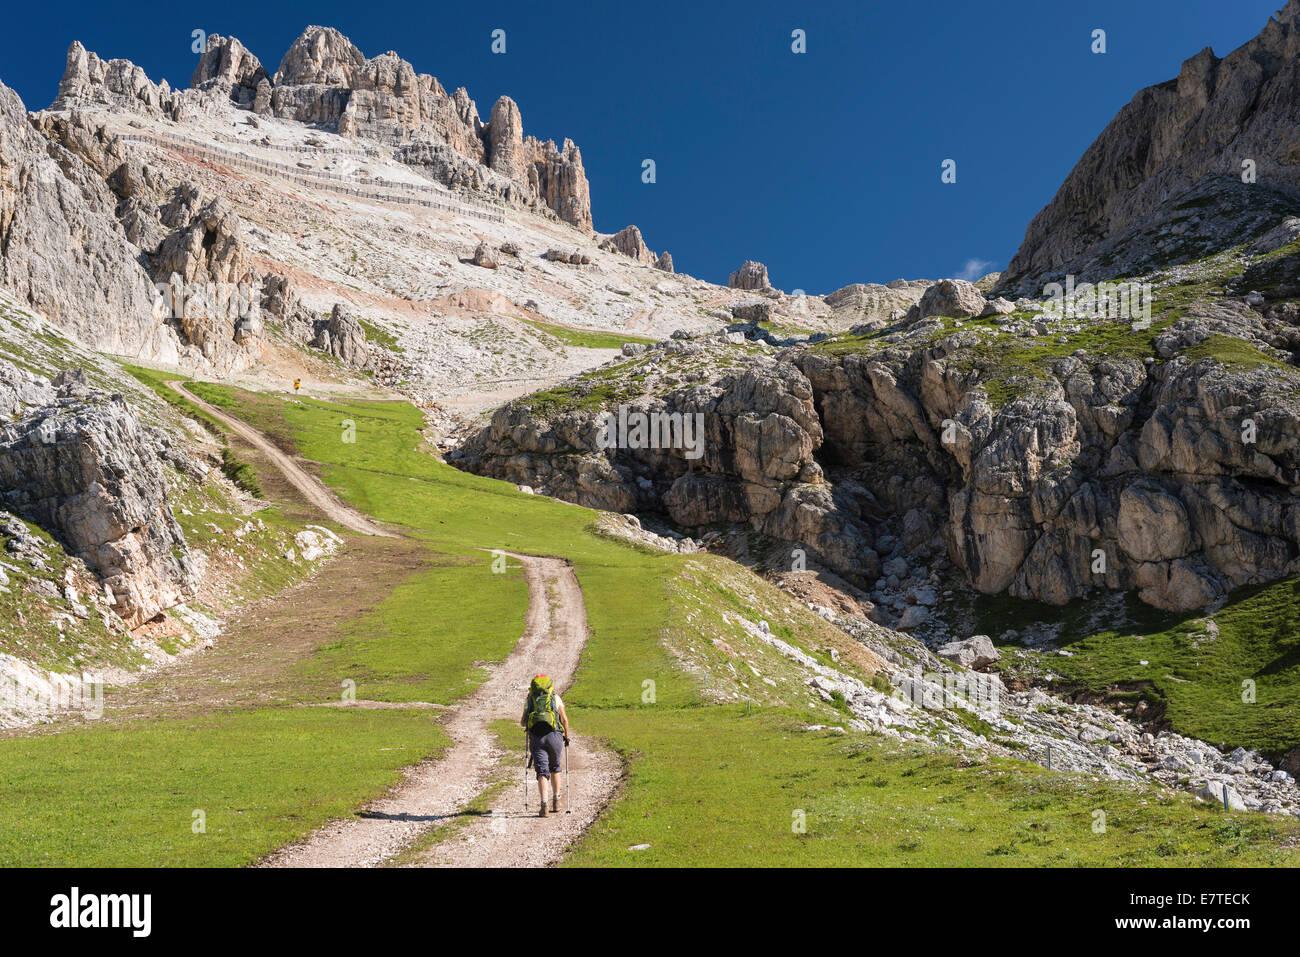 Ascent from Falzarego Pass to the Lagazuoi, long distance hiking trail Italy, Sentiero Italia SI No. 402, Cortina - Stock Image